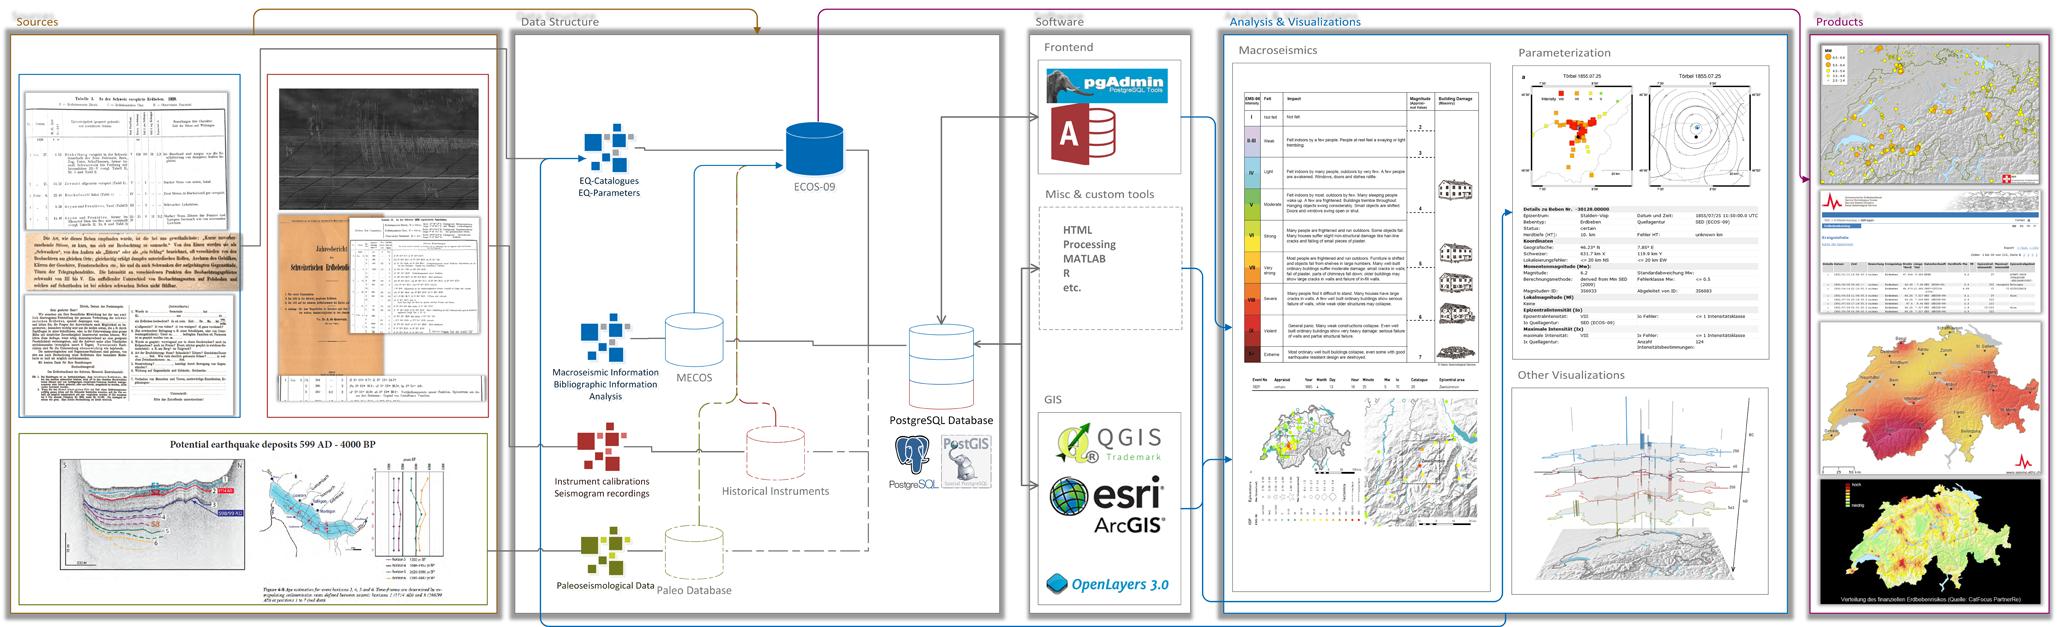 Workflow_ECOS